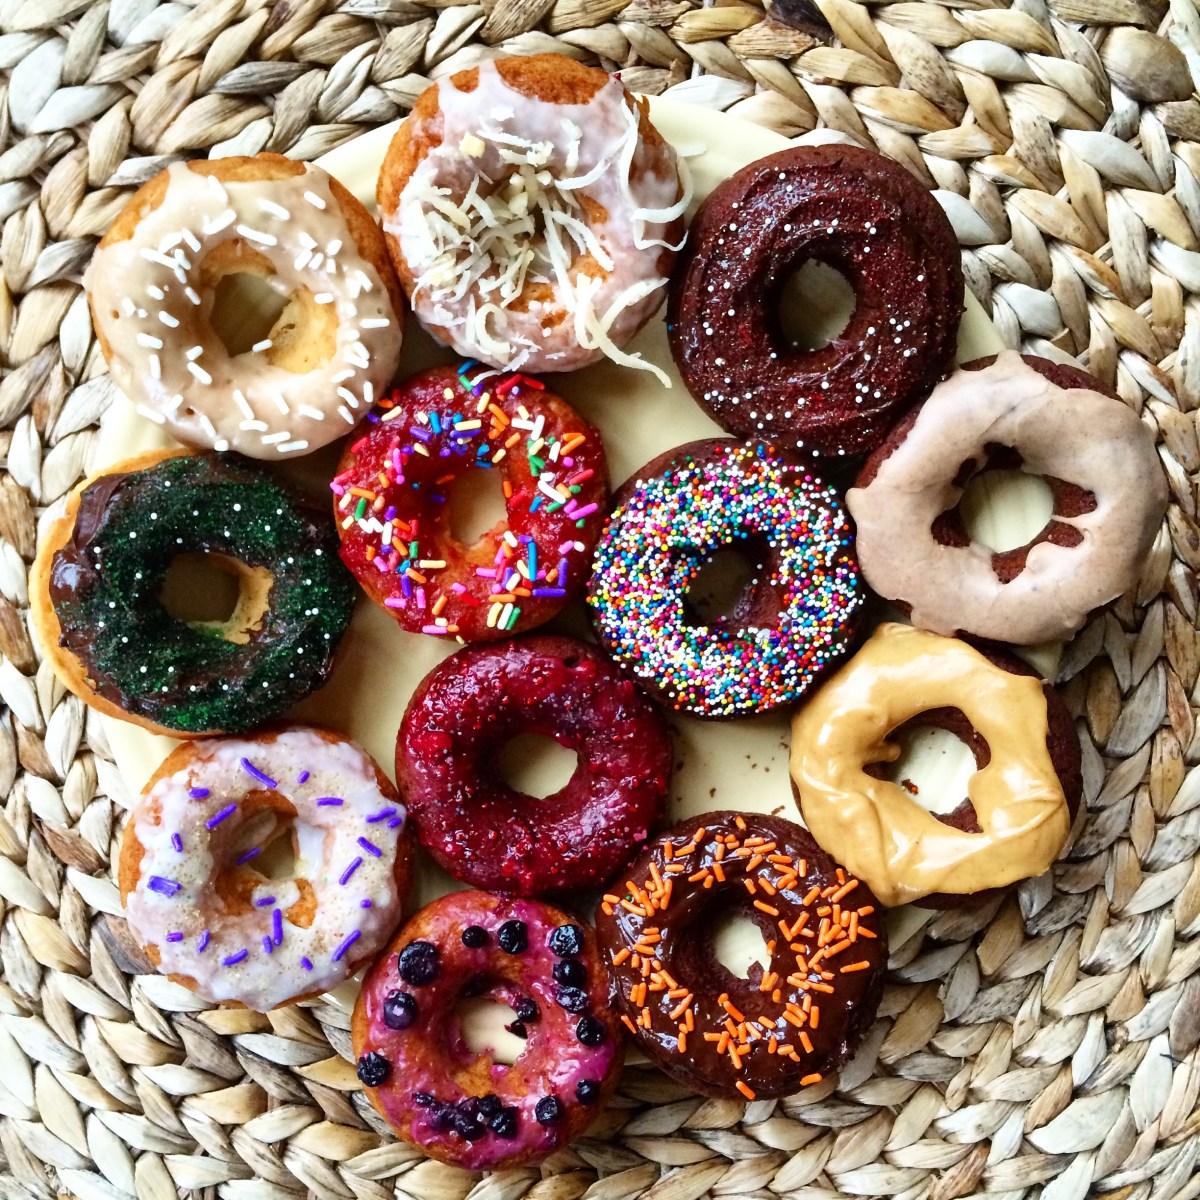 Vegan Donuts: A Random Dozen